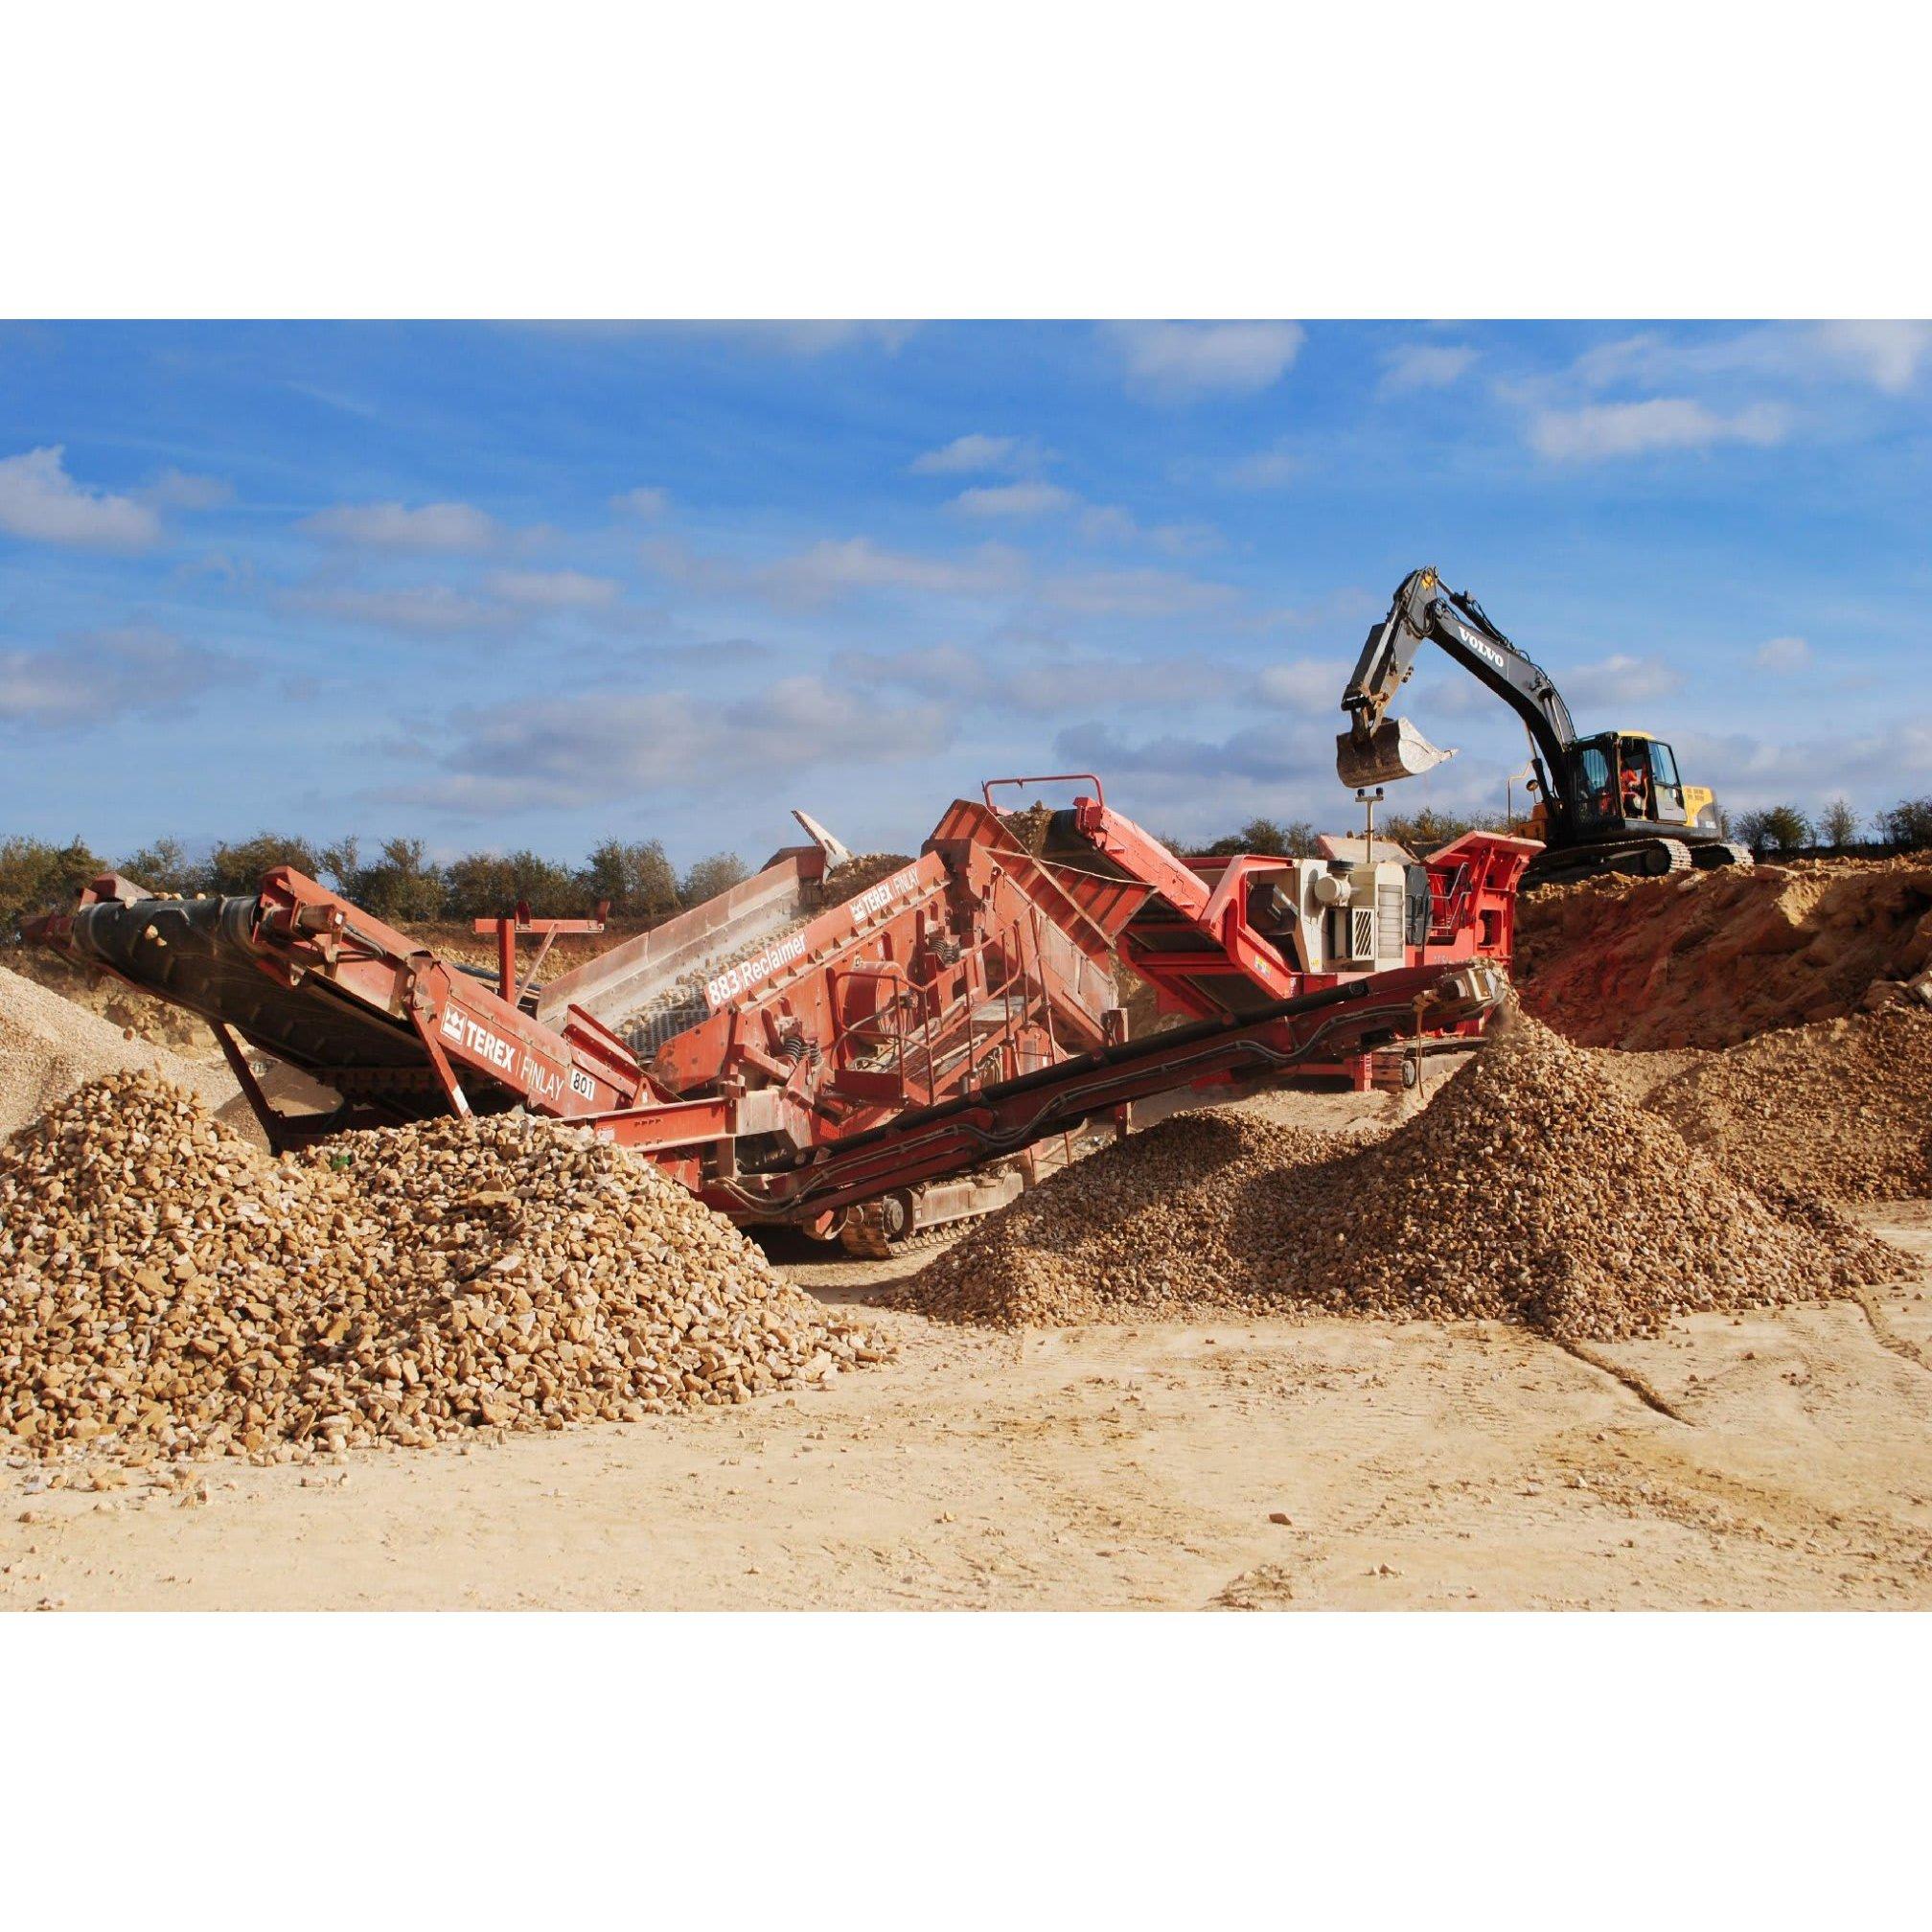 Construction & Environmental Services Ltd - Peterborough, Lincolnshire PE6 8AS - 01733 300789 | ShowMeLocal.com